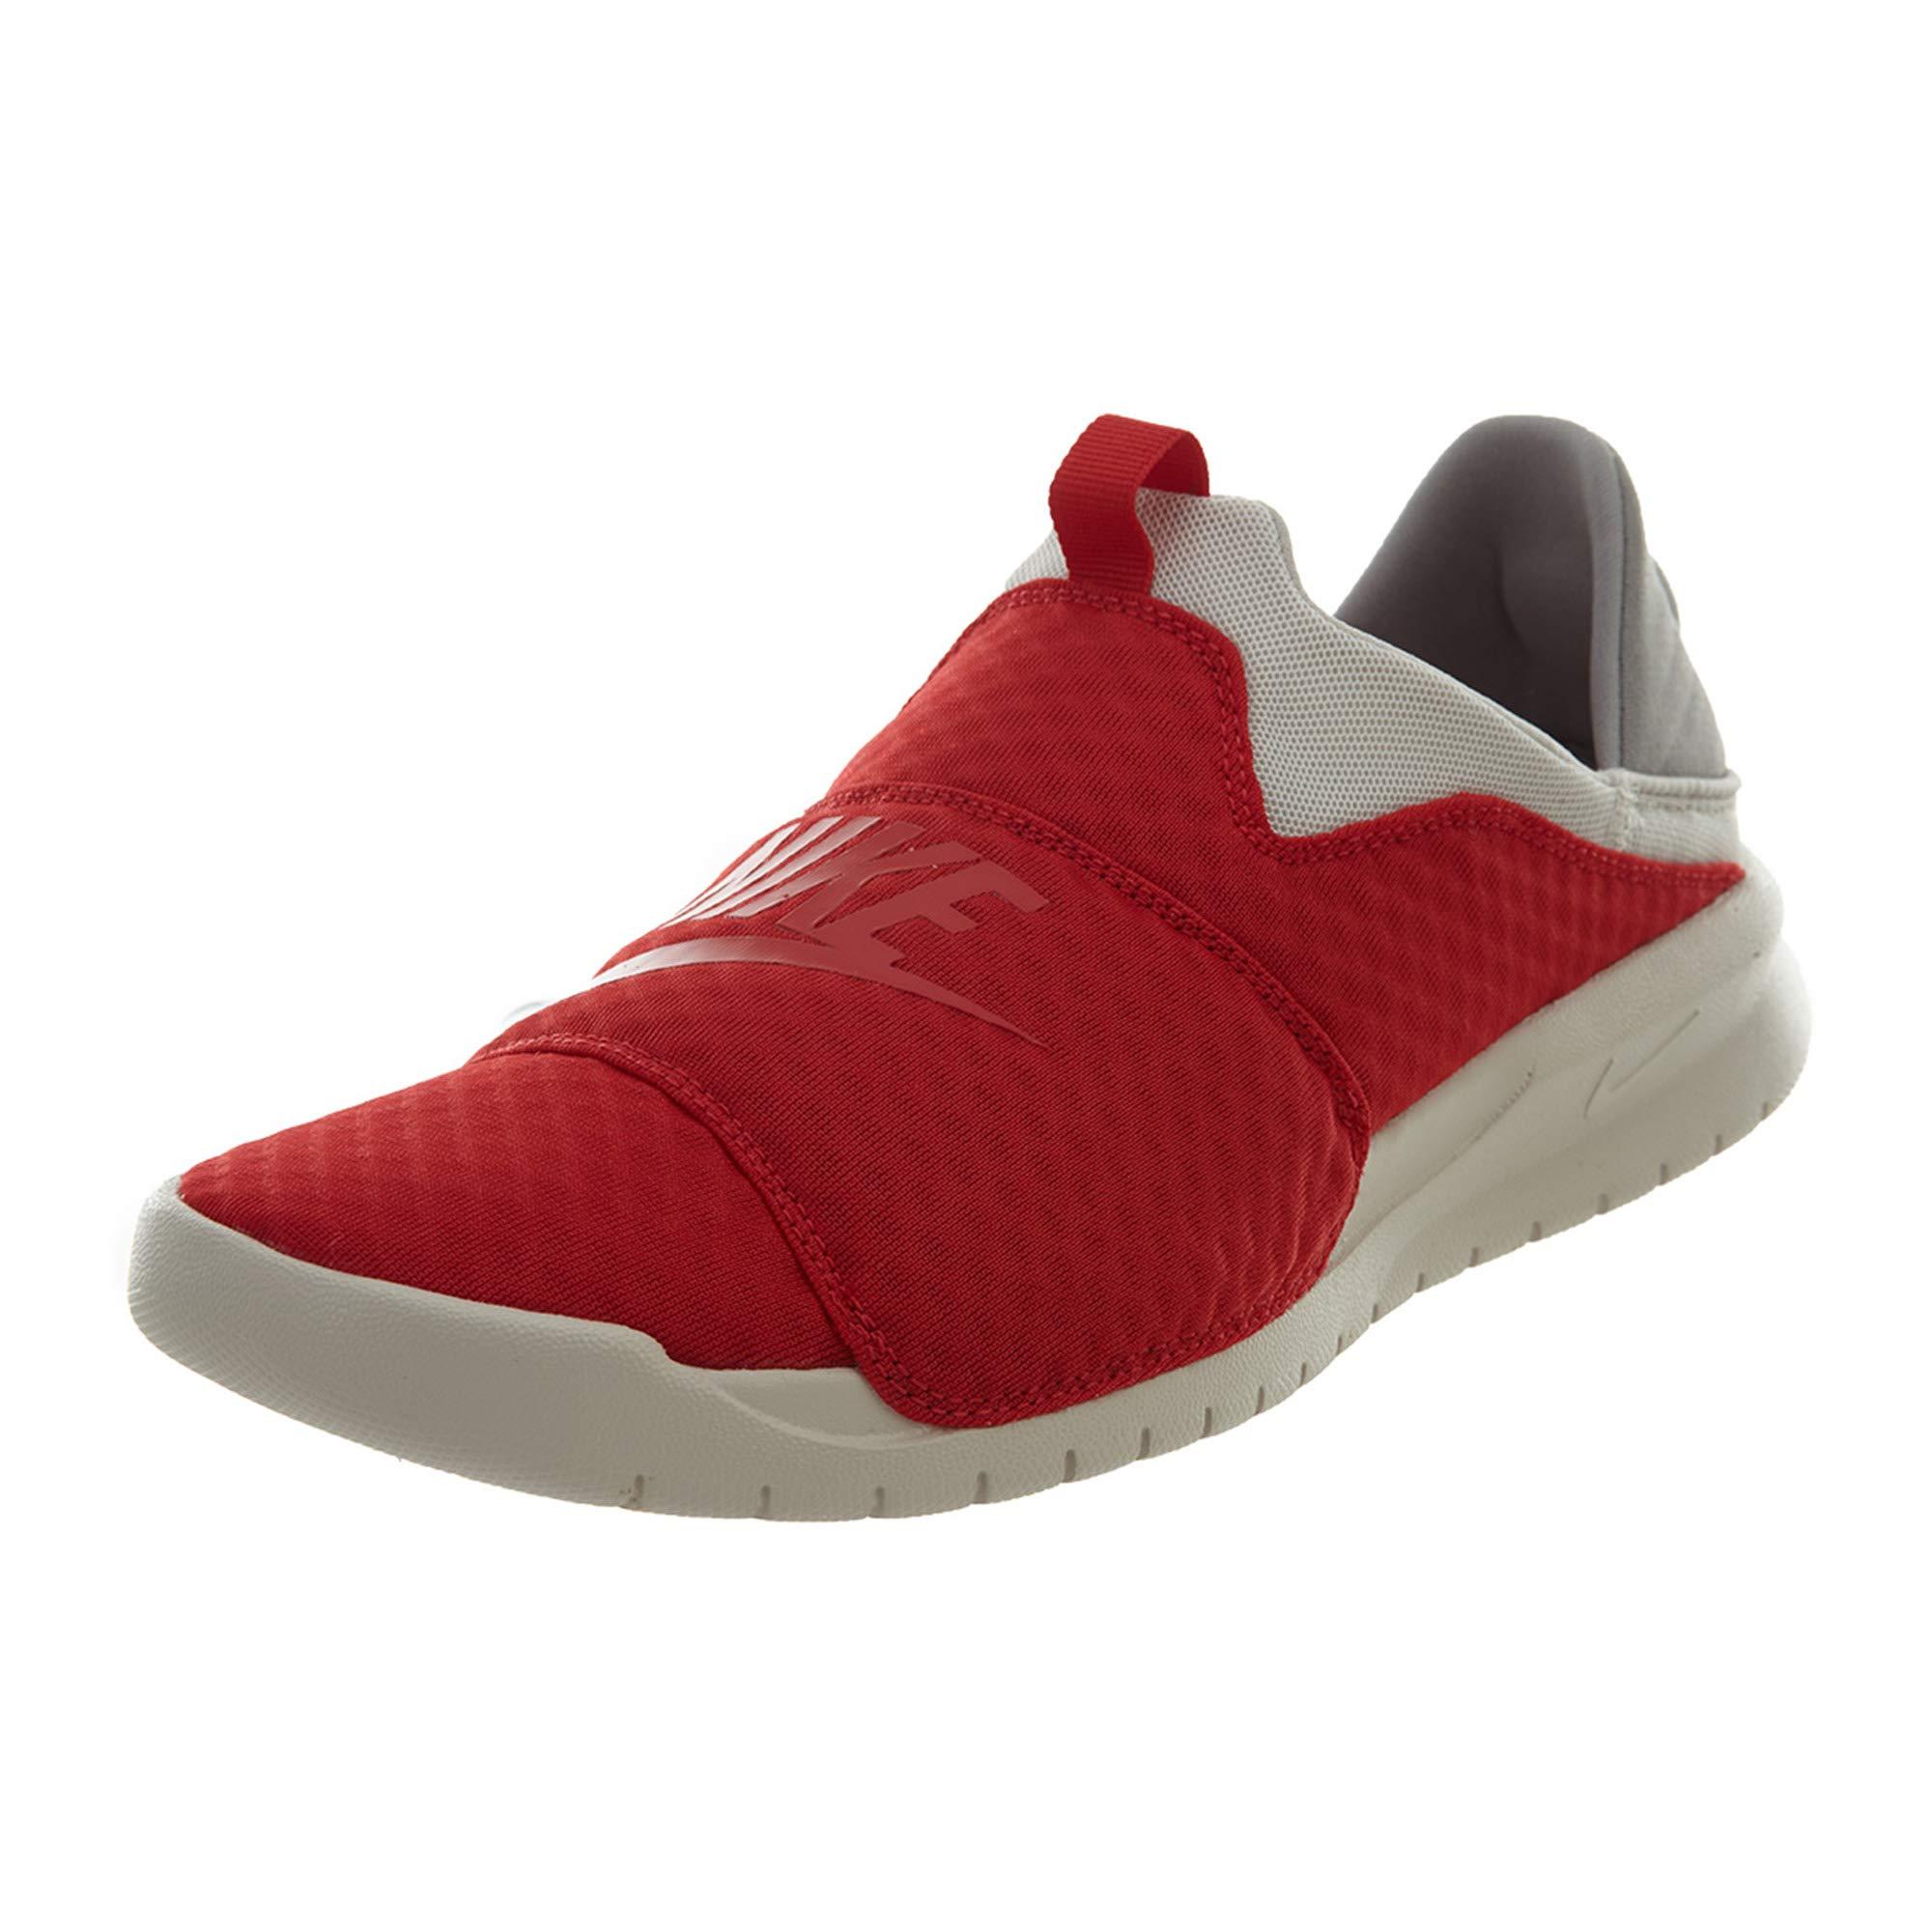 2fb36ed3060498 Galleon - Nike Benassi Slip Men s Shoes University Red University Red 882410-602  (8 D(M) US)